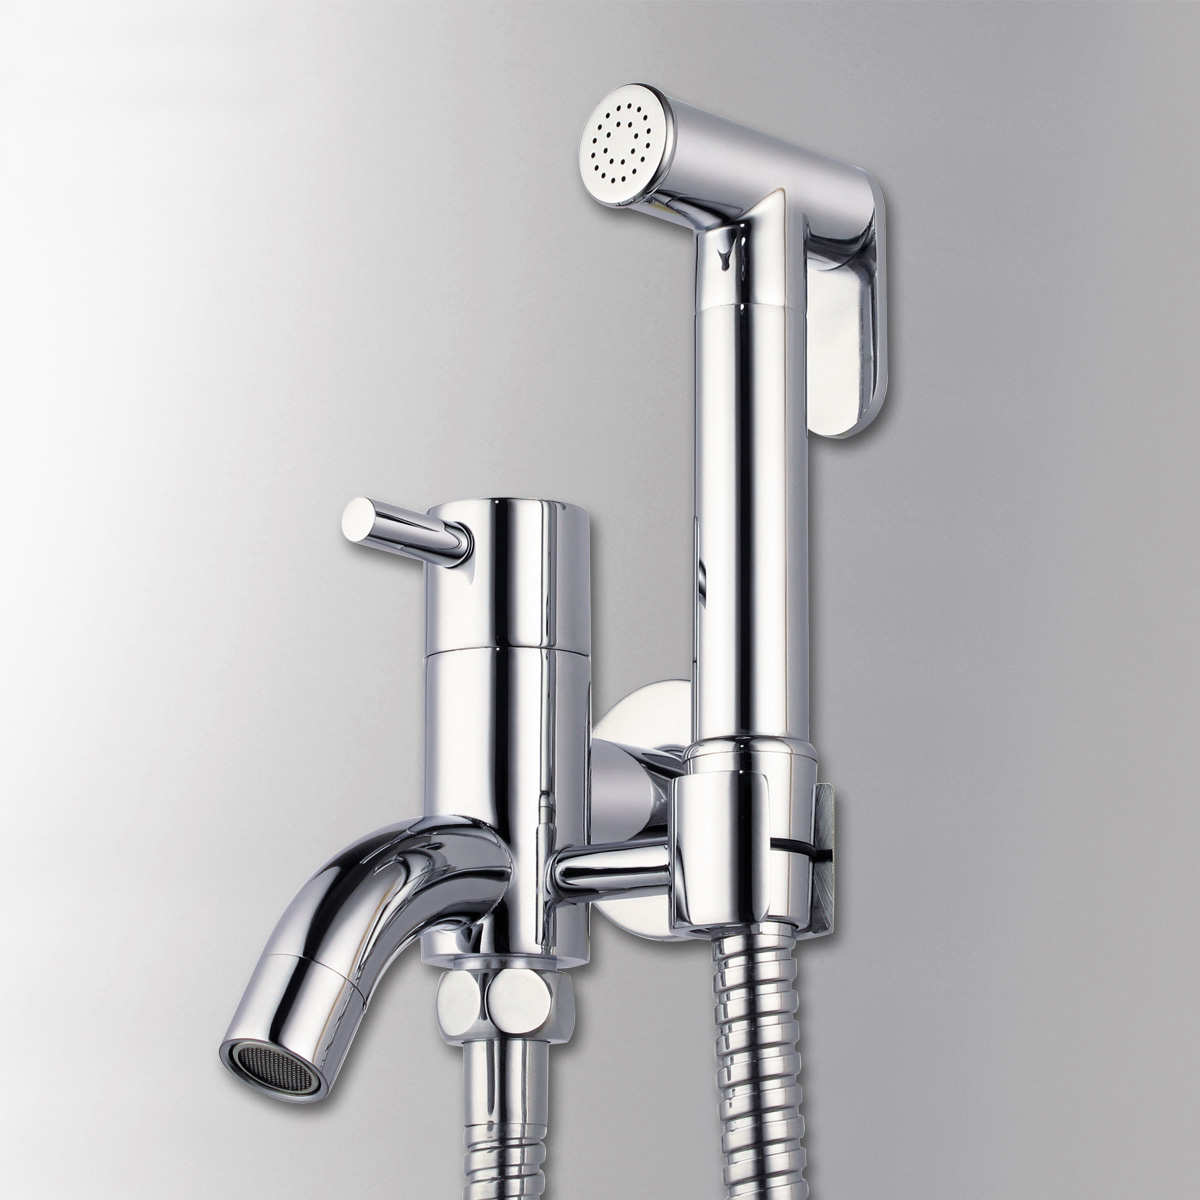 brass toilet bibcock protable hand held bidet shower spray. Black Bedroom Furniture Sets. Home Design Ideas